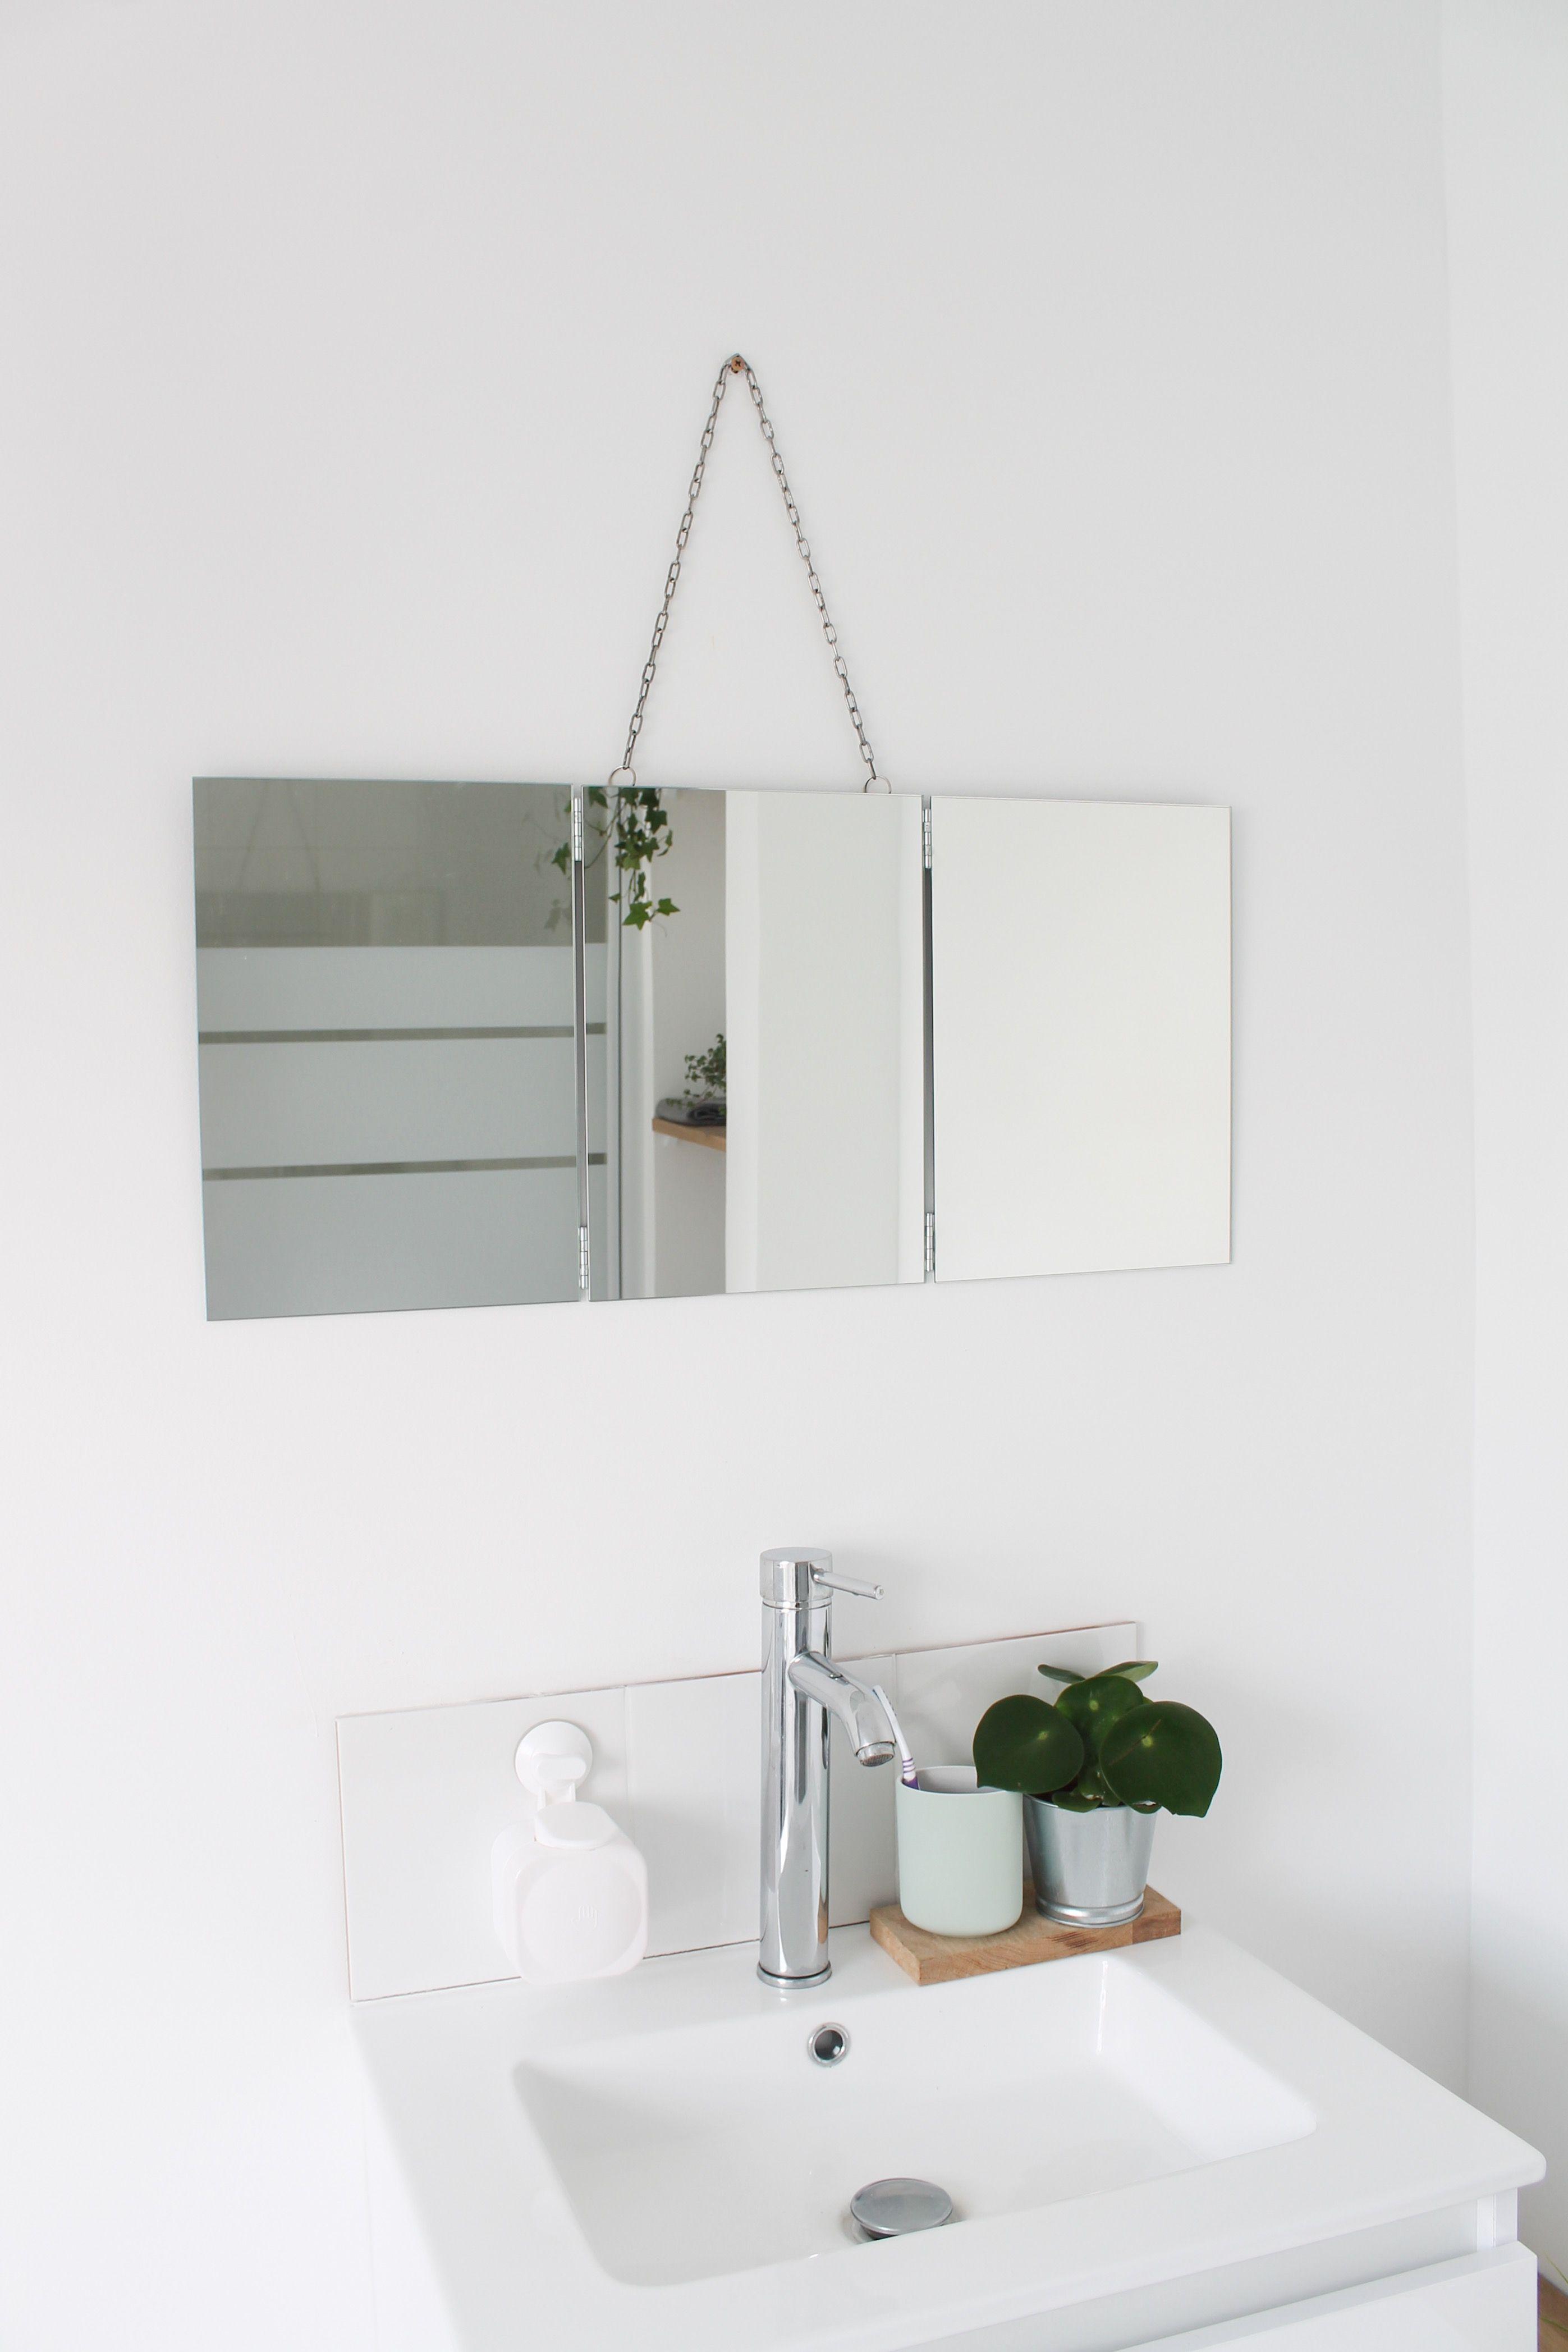 DIY MIROIR DE BARBIER TRIPTYQUE  Diy miroir, Miroir de barbier